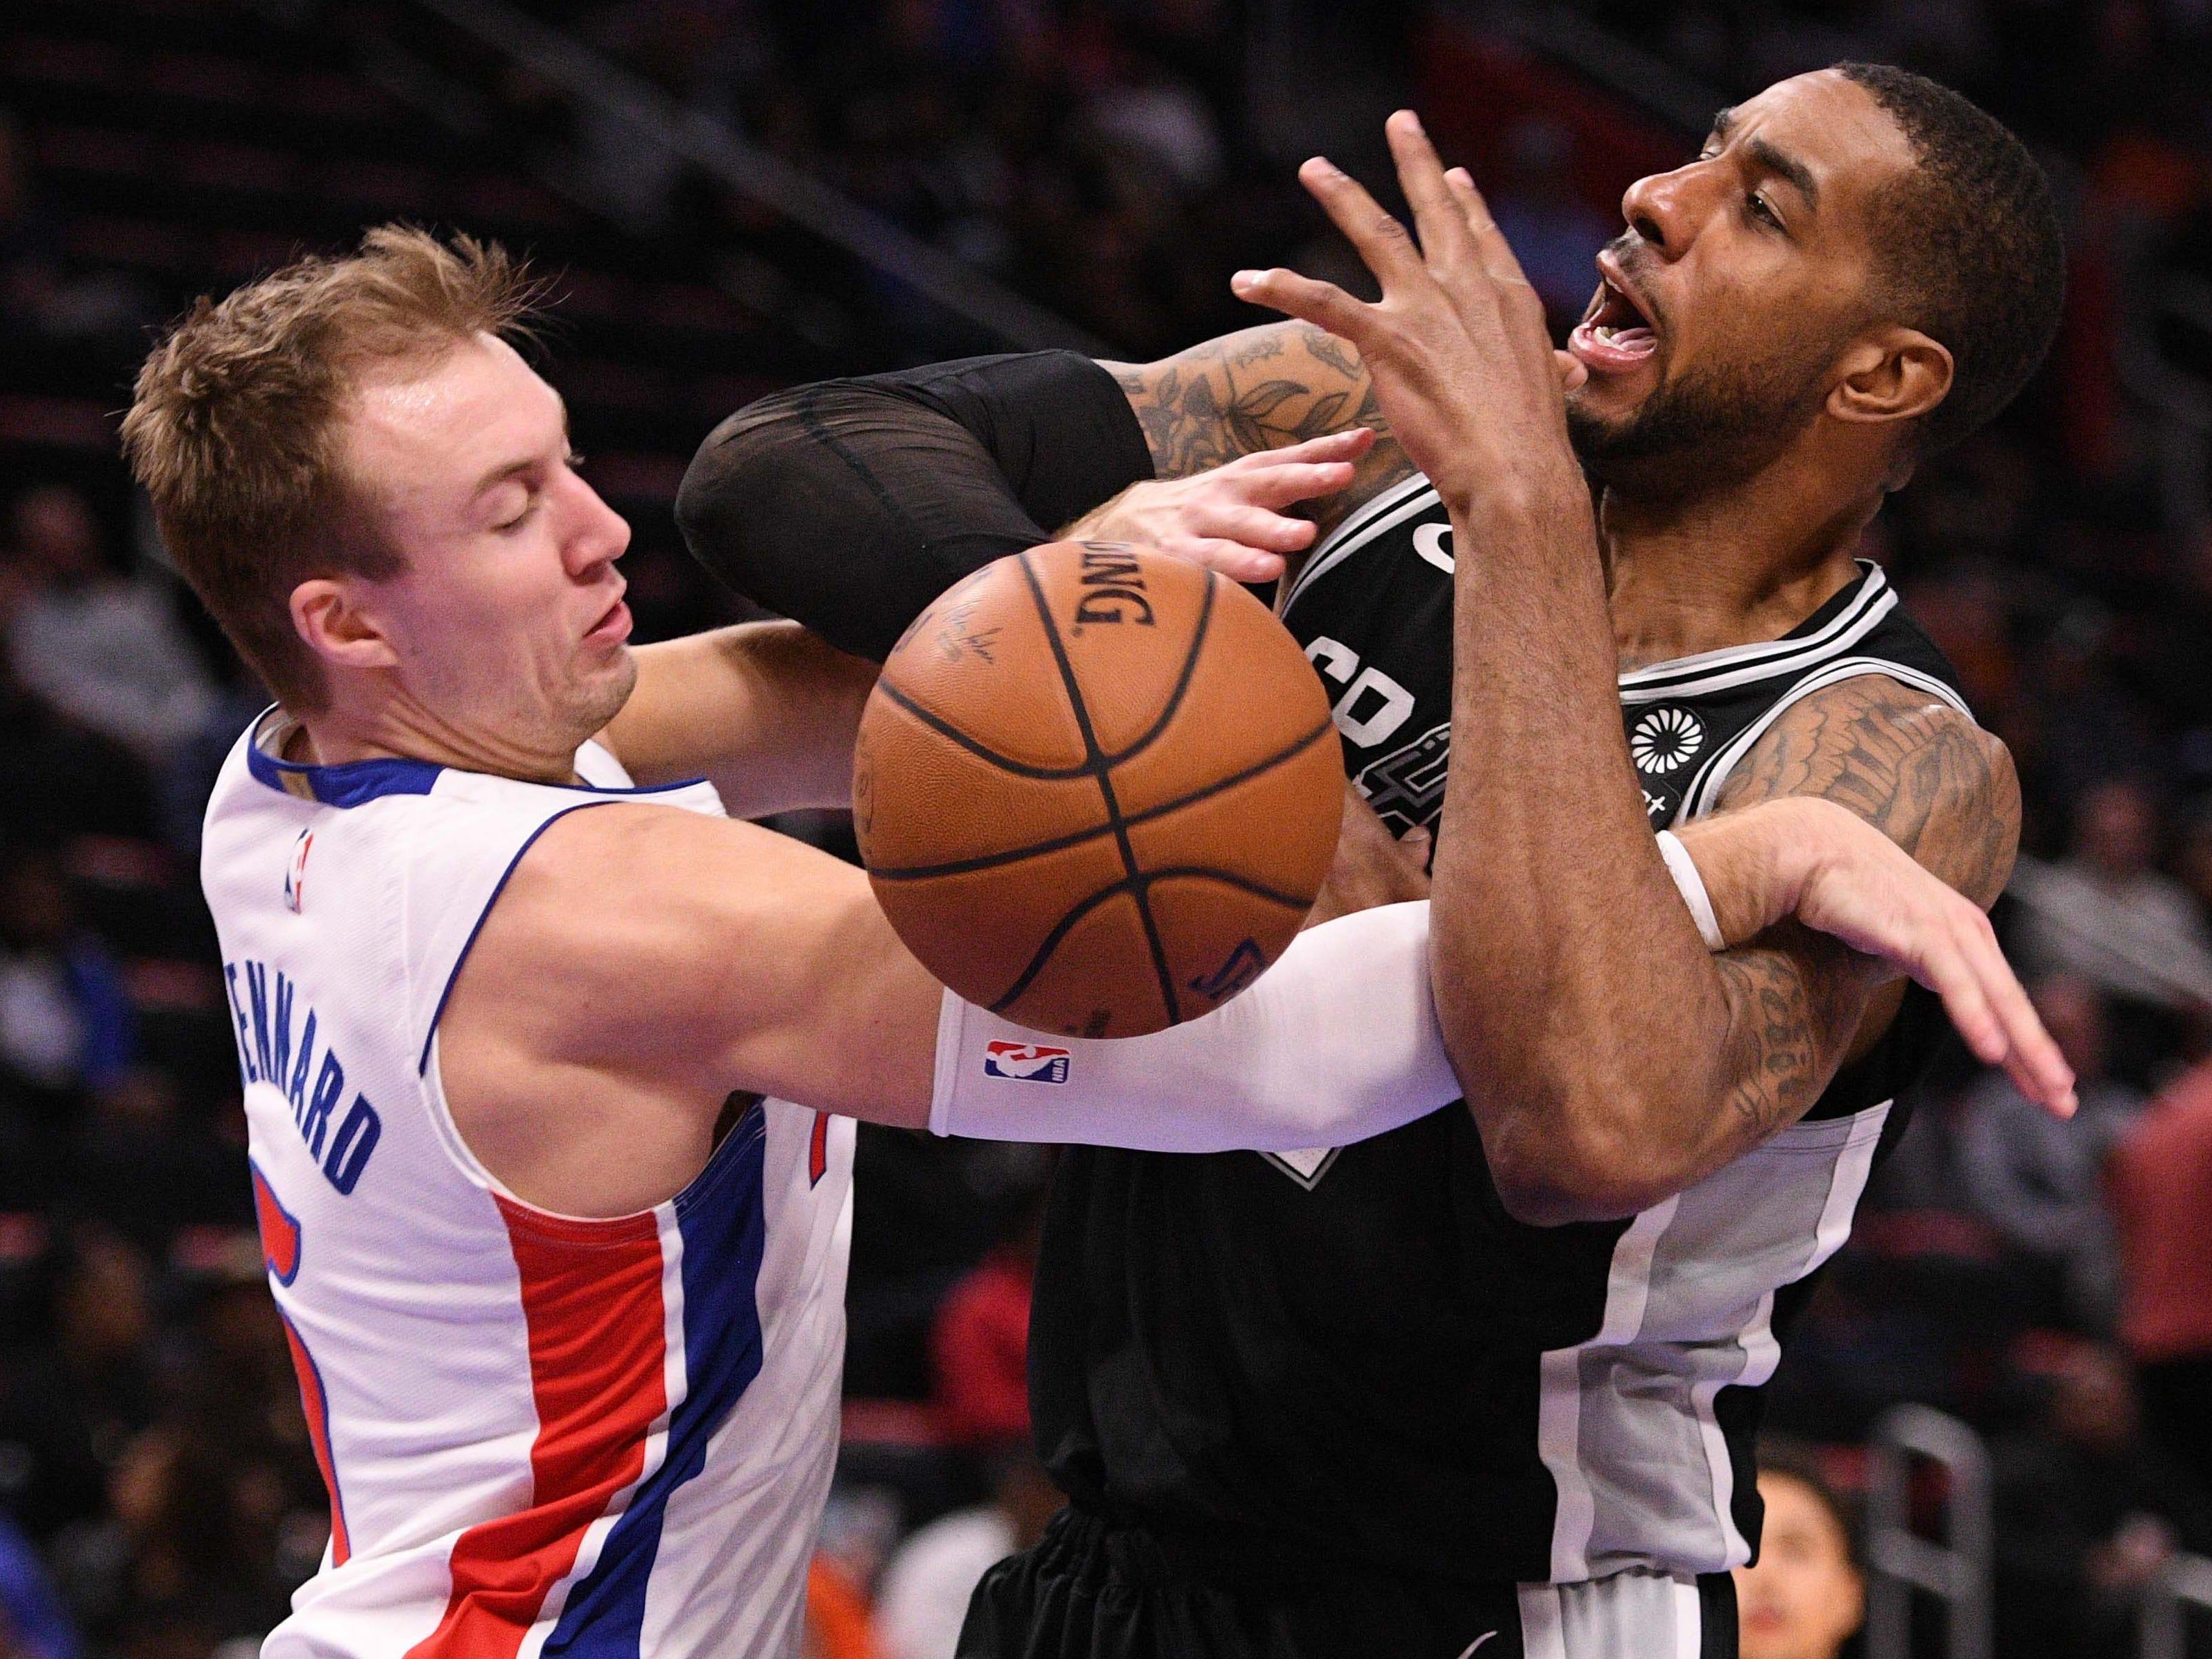 Jan. 7: Pistons guard Luke Kennard (5) fouls Spurs forward LaMarcus Aldridge (12) during the fourth quarter at Little Caesars Arena in Detroit.